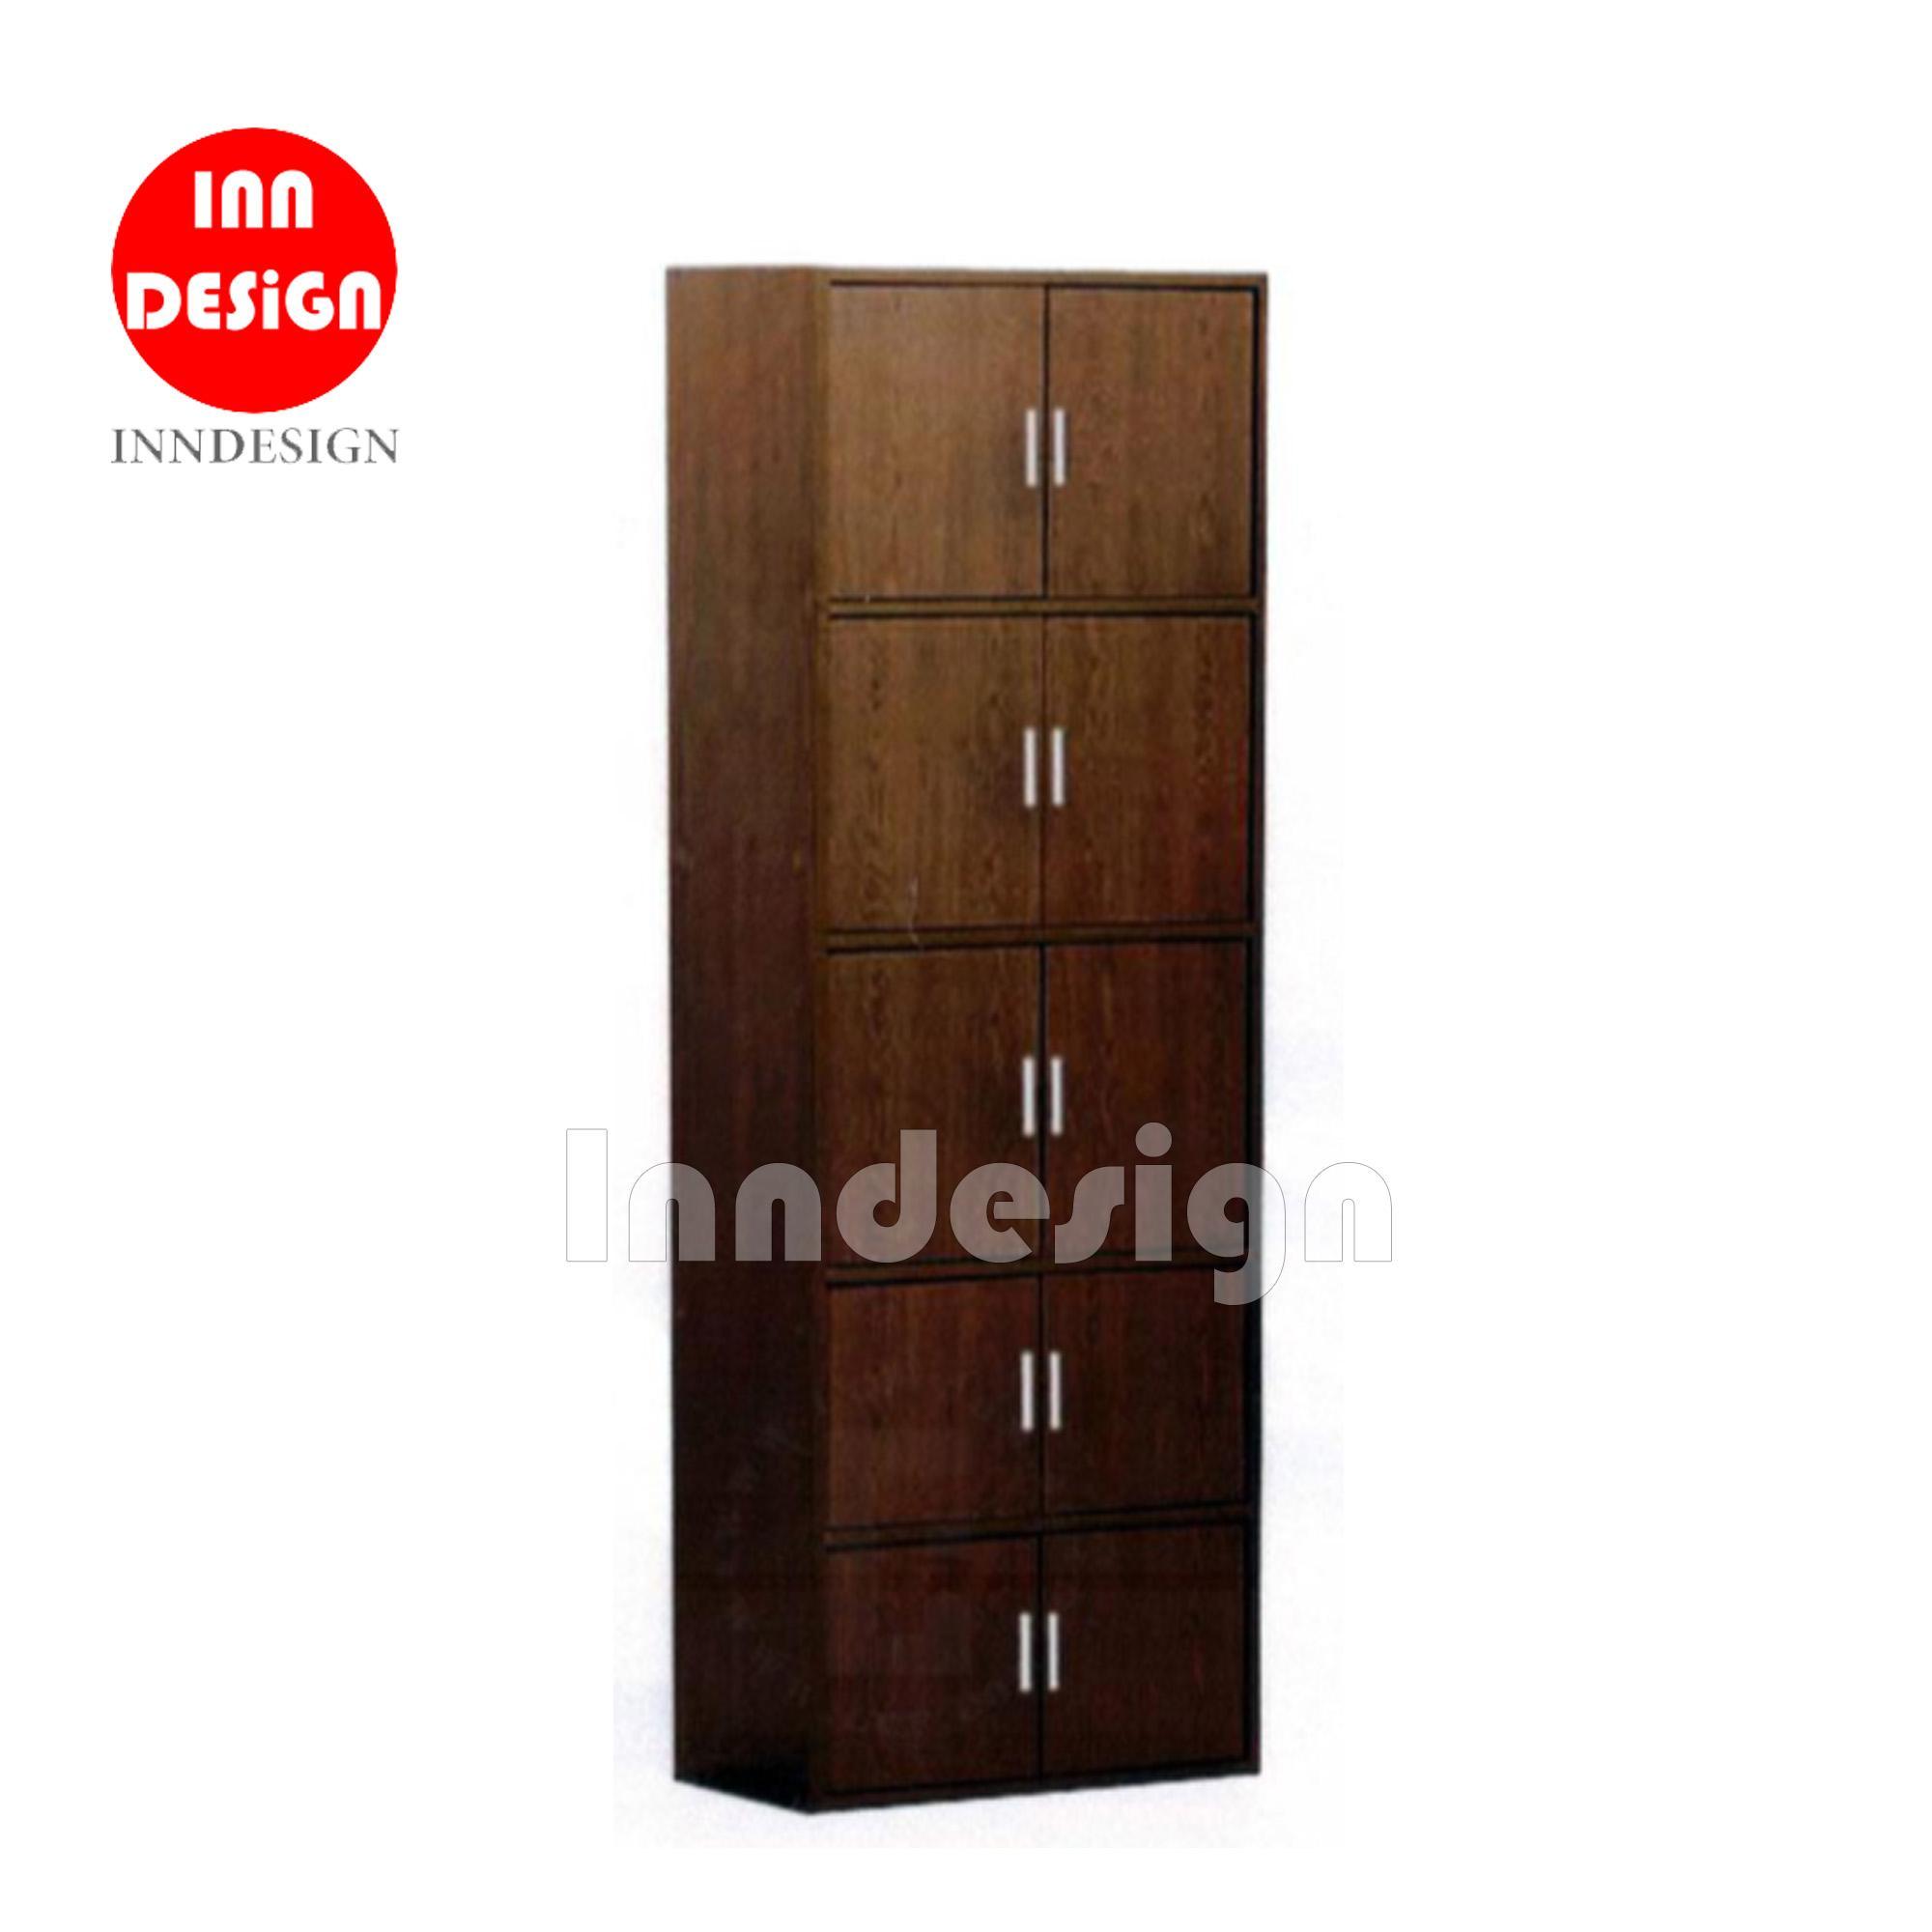 Elly IIV Bookshelf/ Cabinet / Utility Cabinet / Storage Cabinet